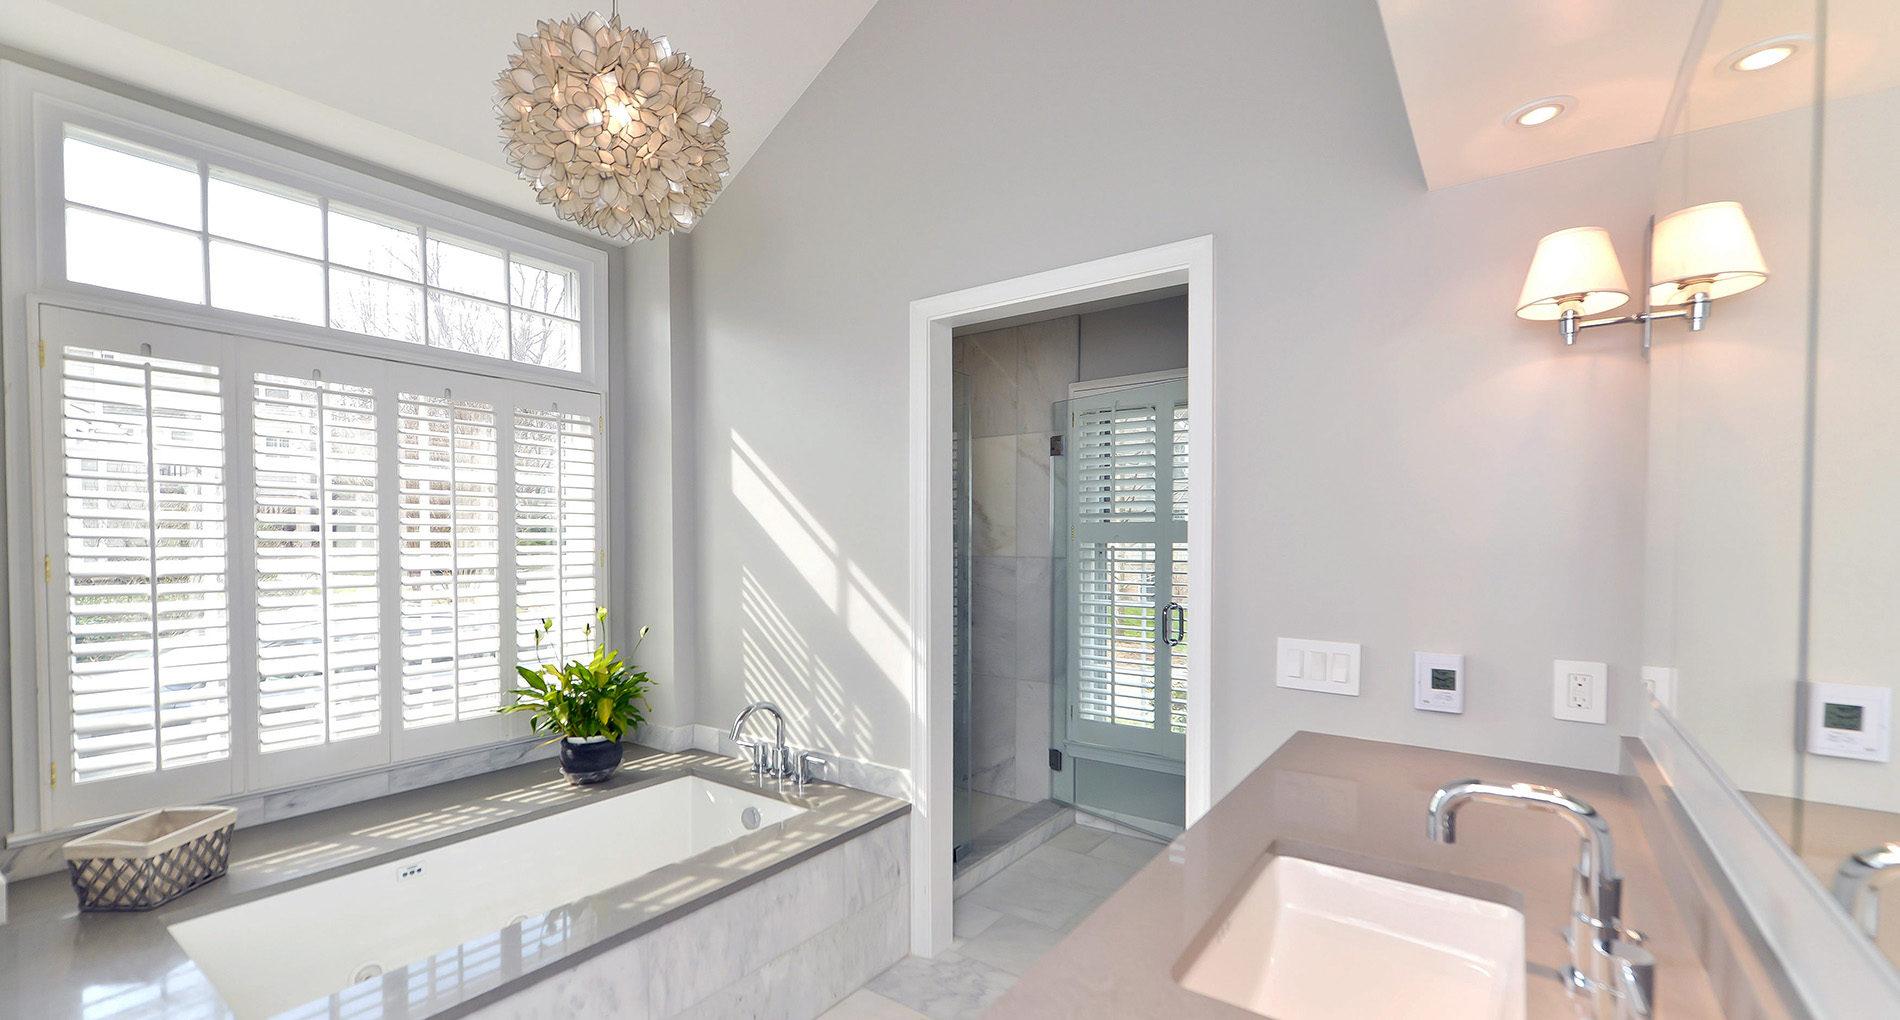 Arlington Custom Bathroom Remodeling & Design | Alair Homes Arlington